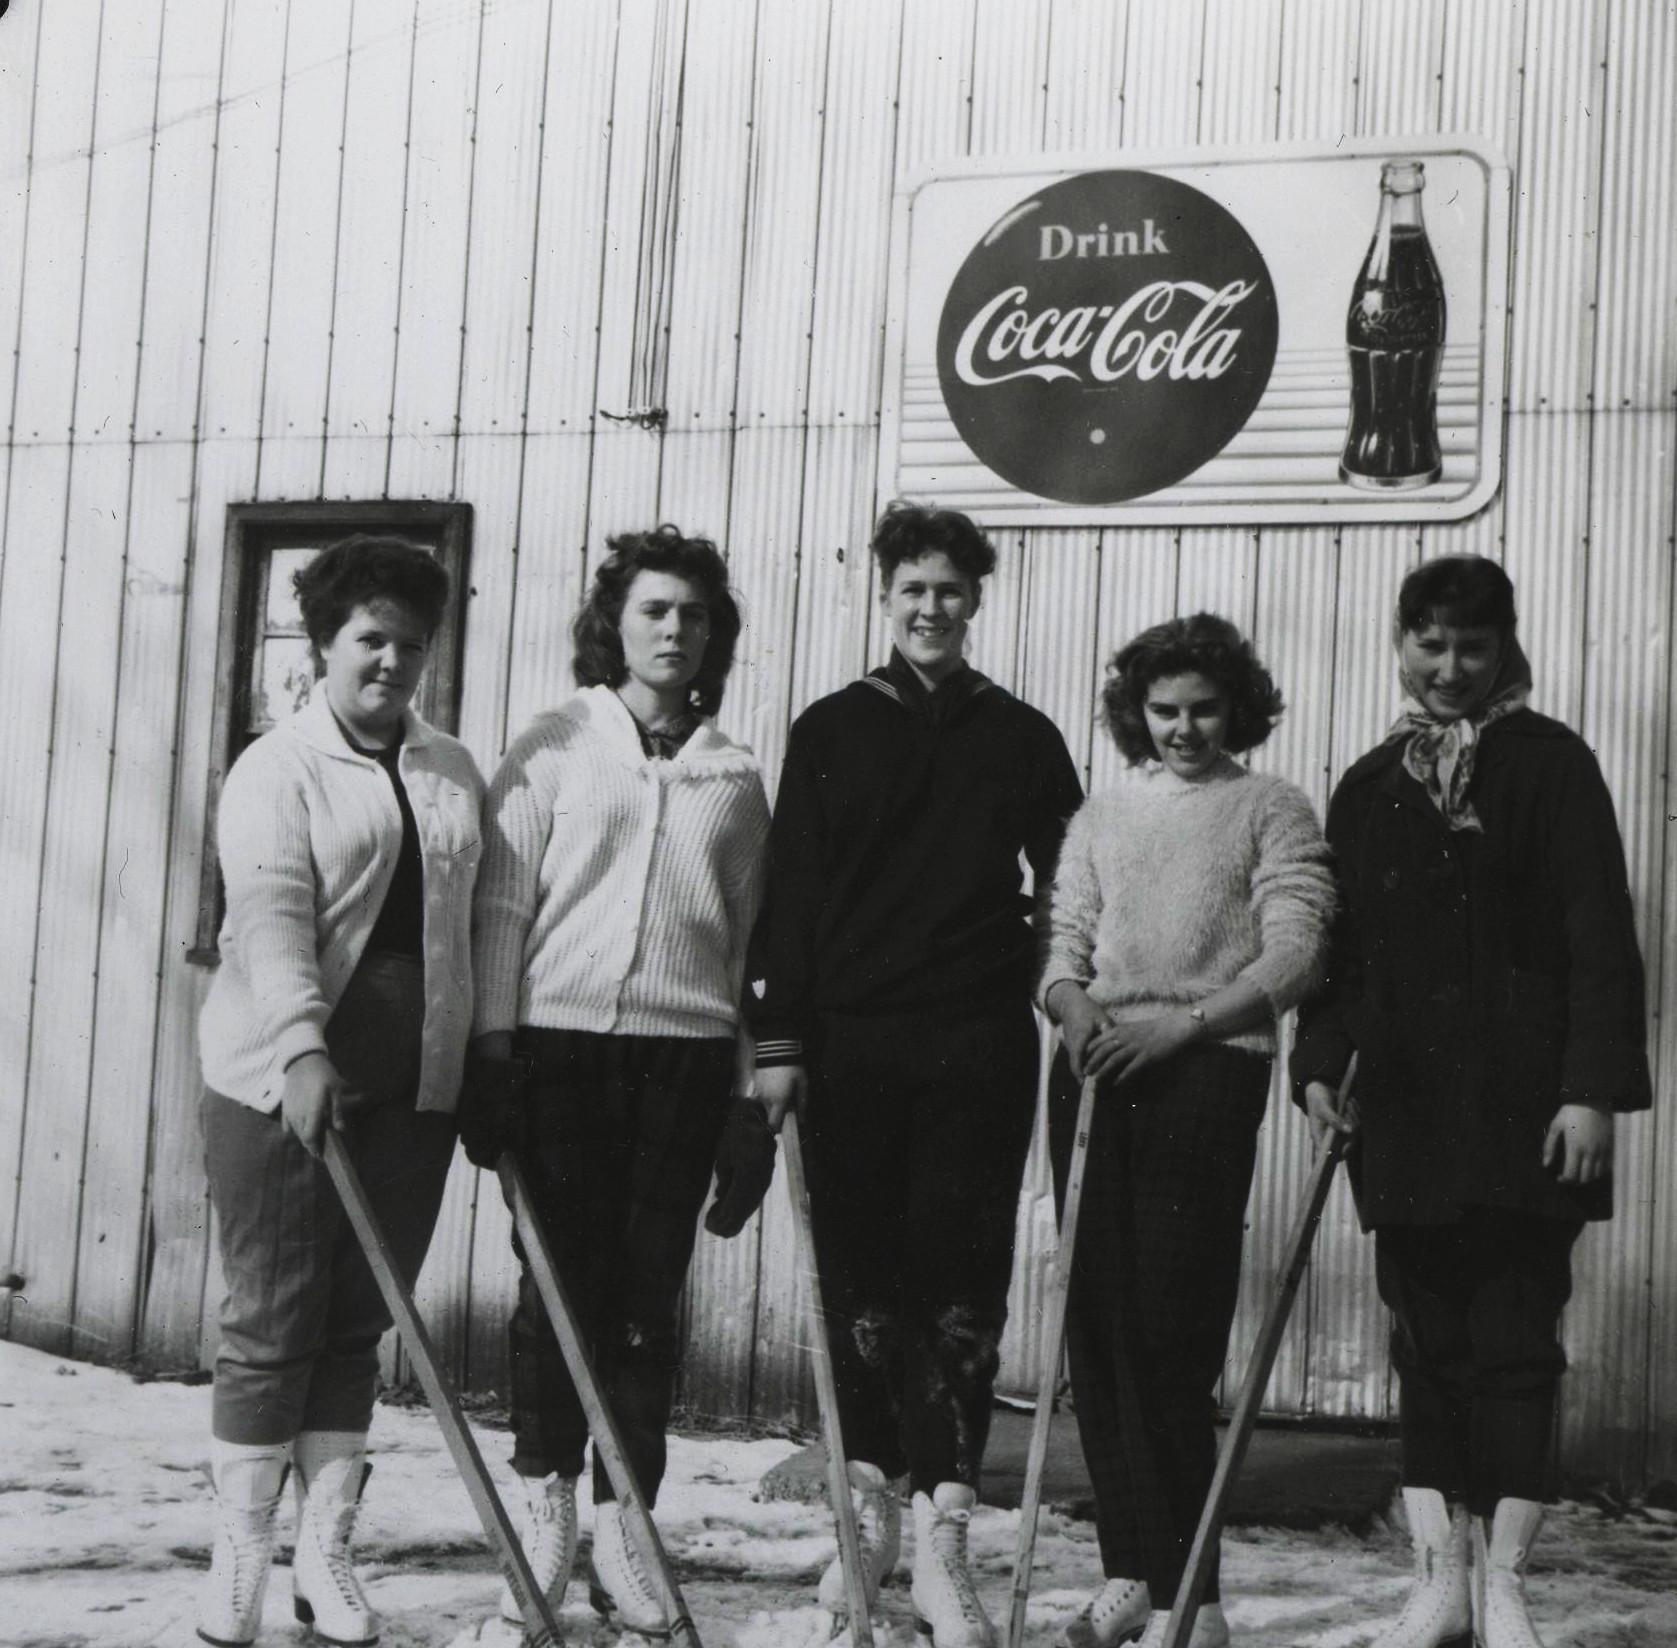 Mary Meehan, unkown,Marg Callery, Carolyn Peters, Doris Bedore